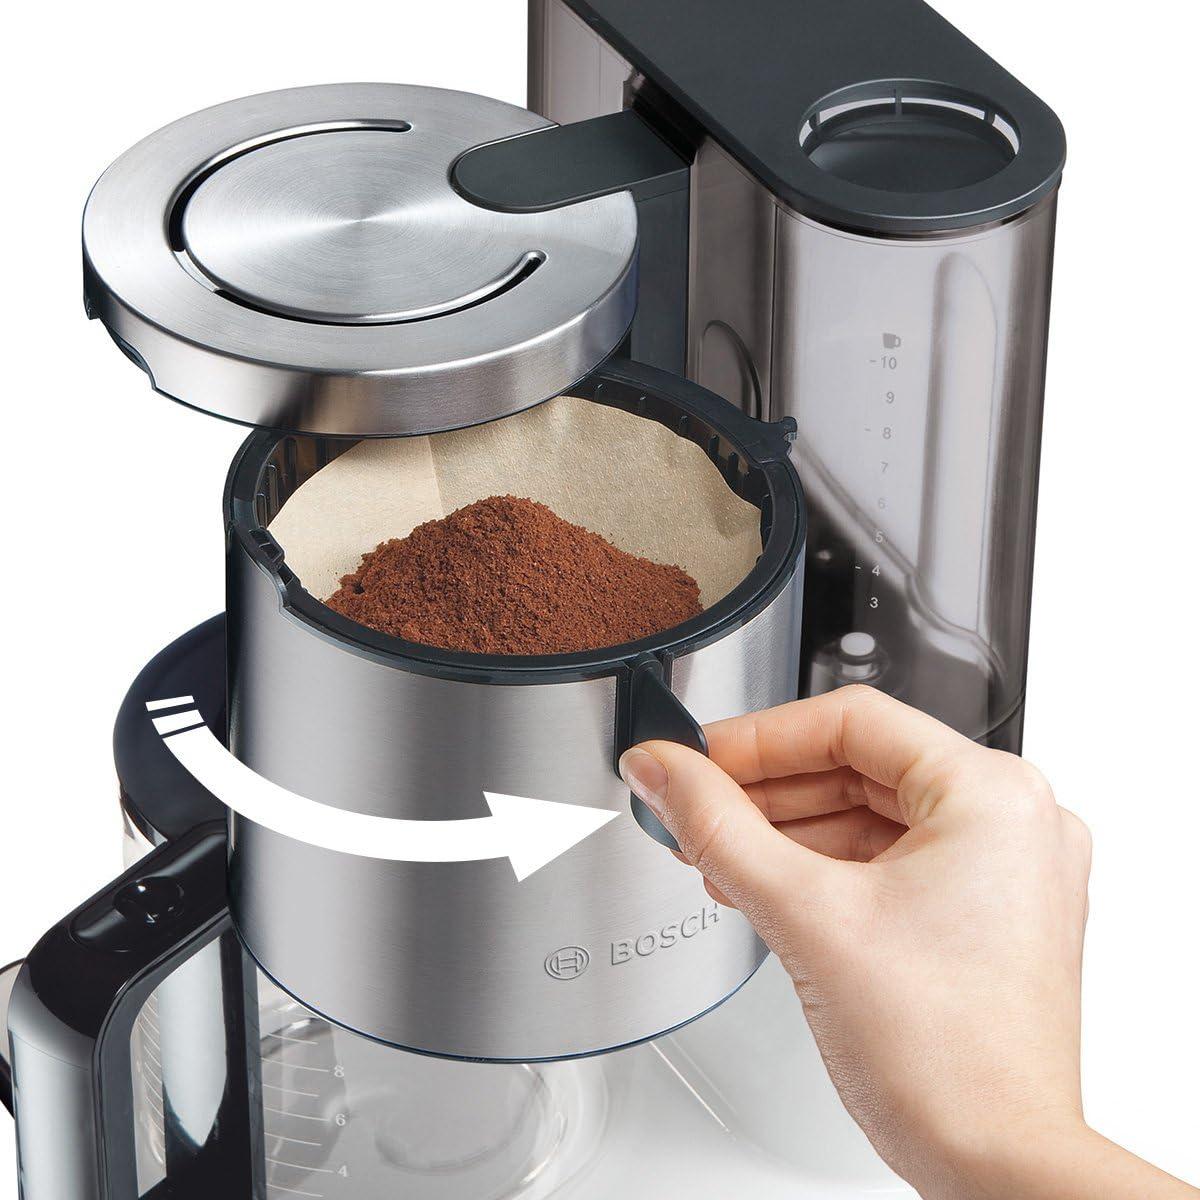 f/ür 10-15 Tassen 1160 Watt max Bosch TKA8631 Kaffeemaschine Styline